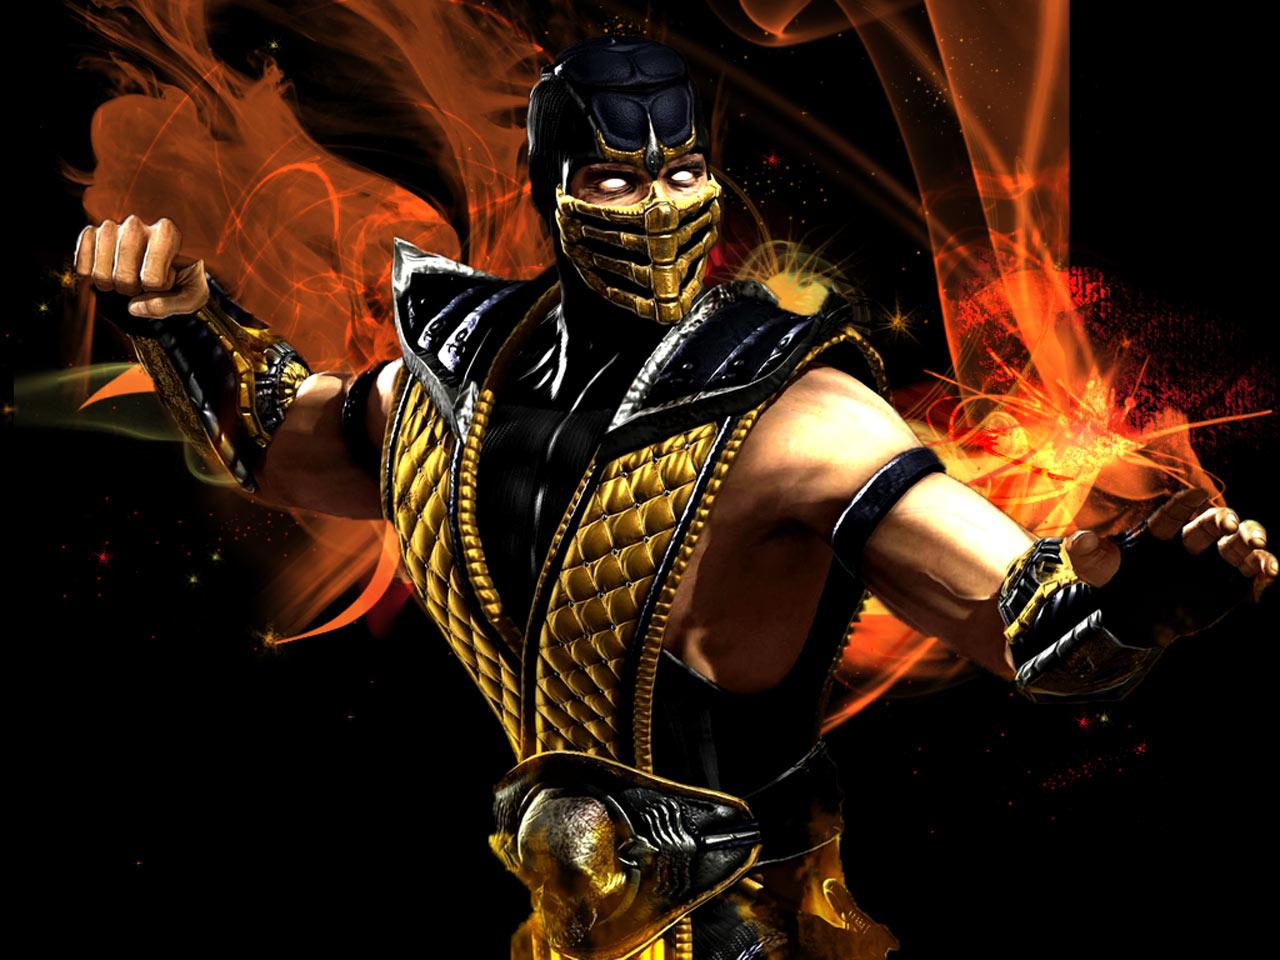 Gallery For gt Mortal Kombat Scorpion Wallpaper 2012 1280x960